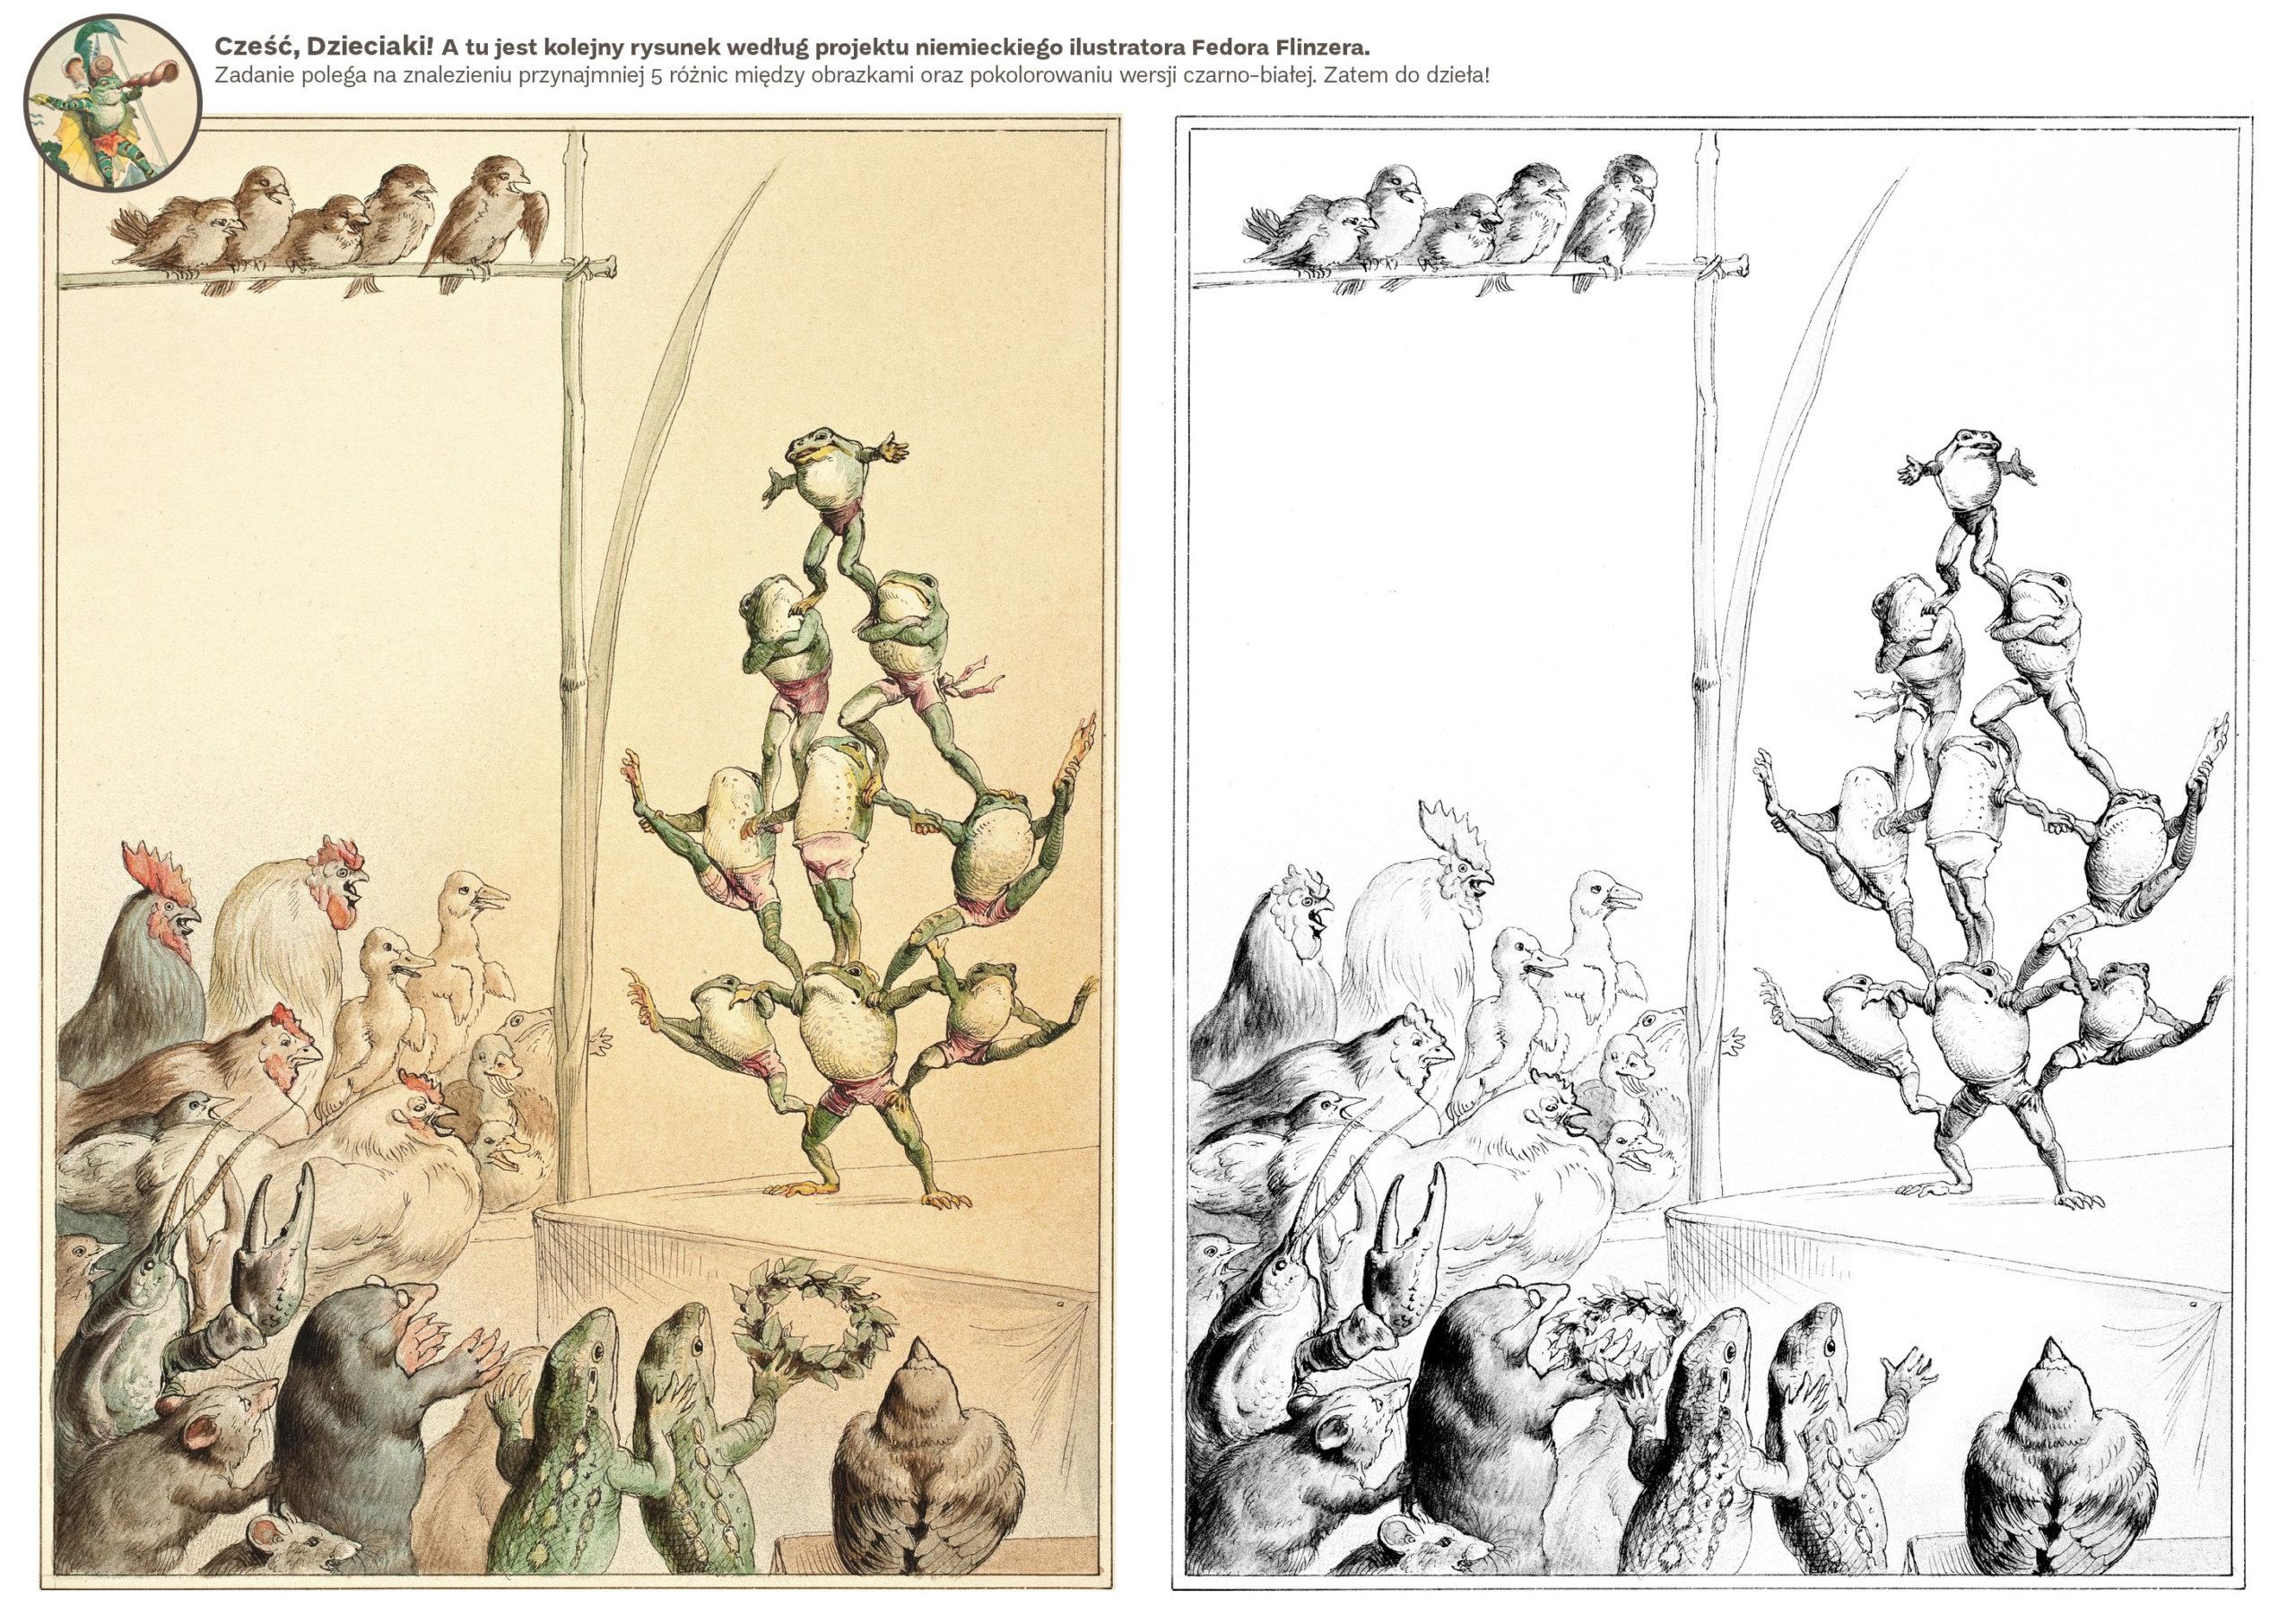 Ilustracja Fedora Flinzera